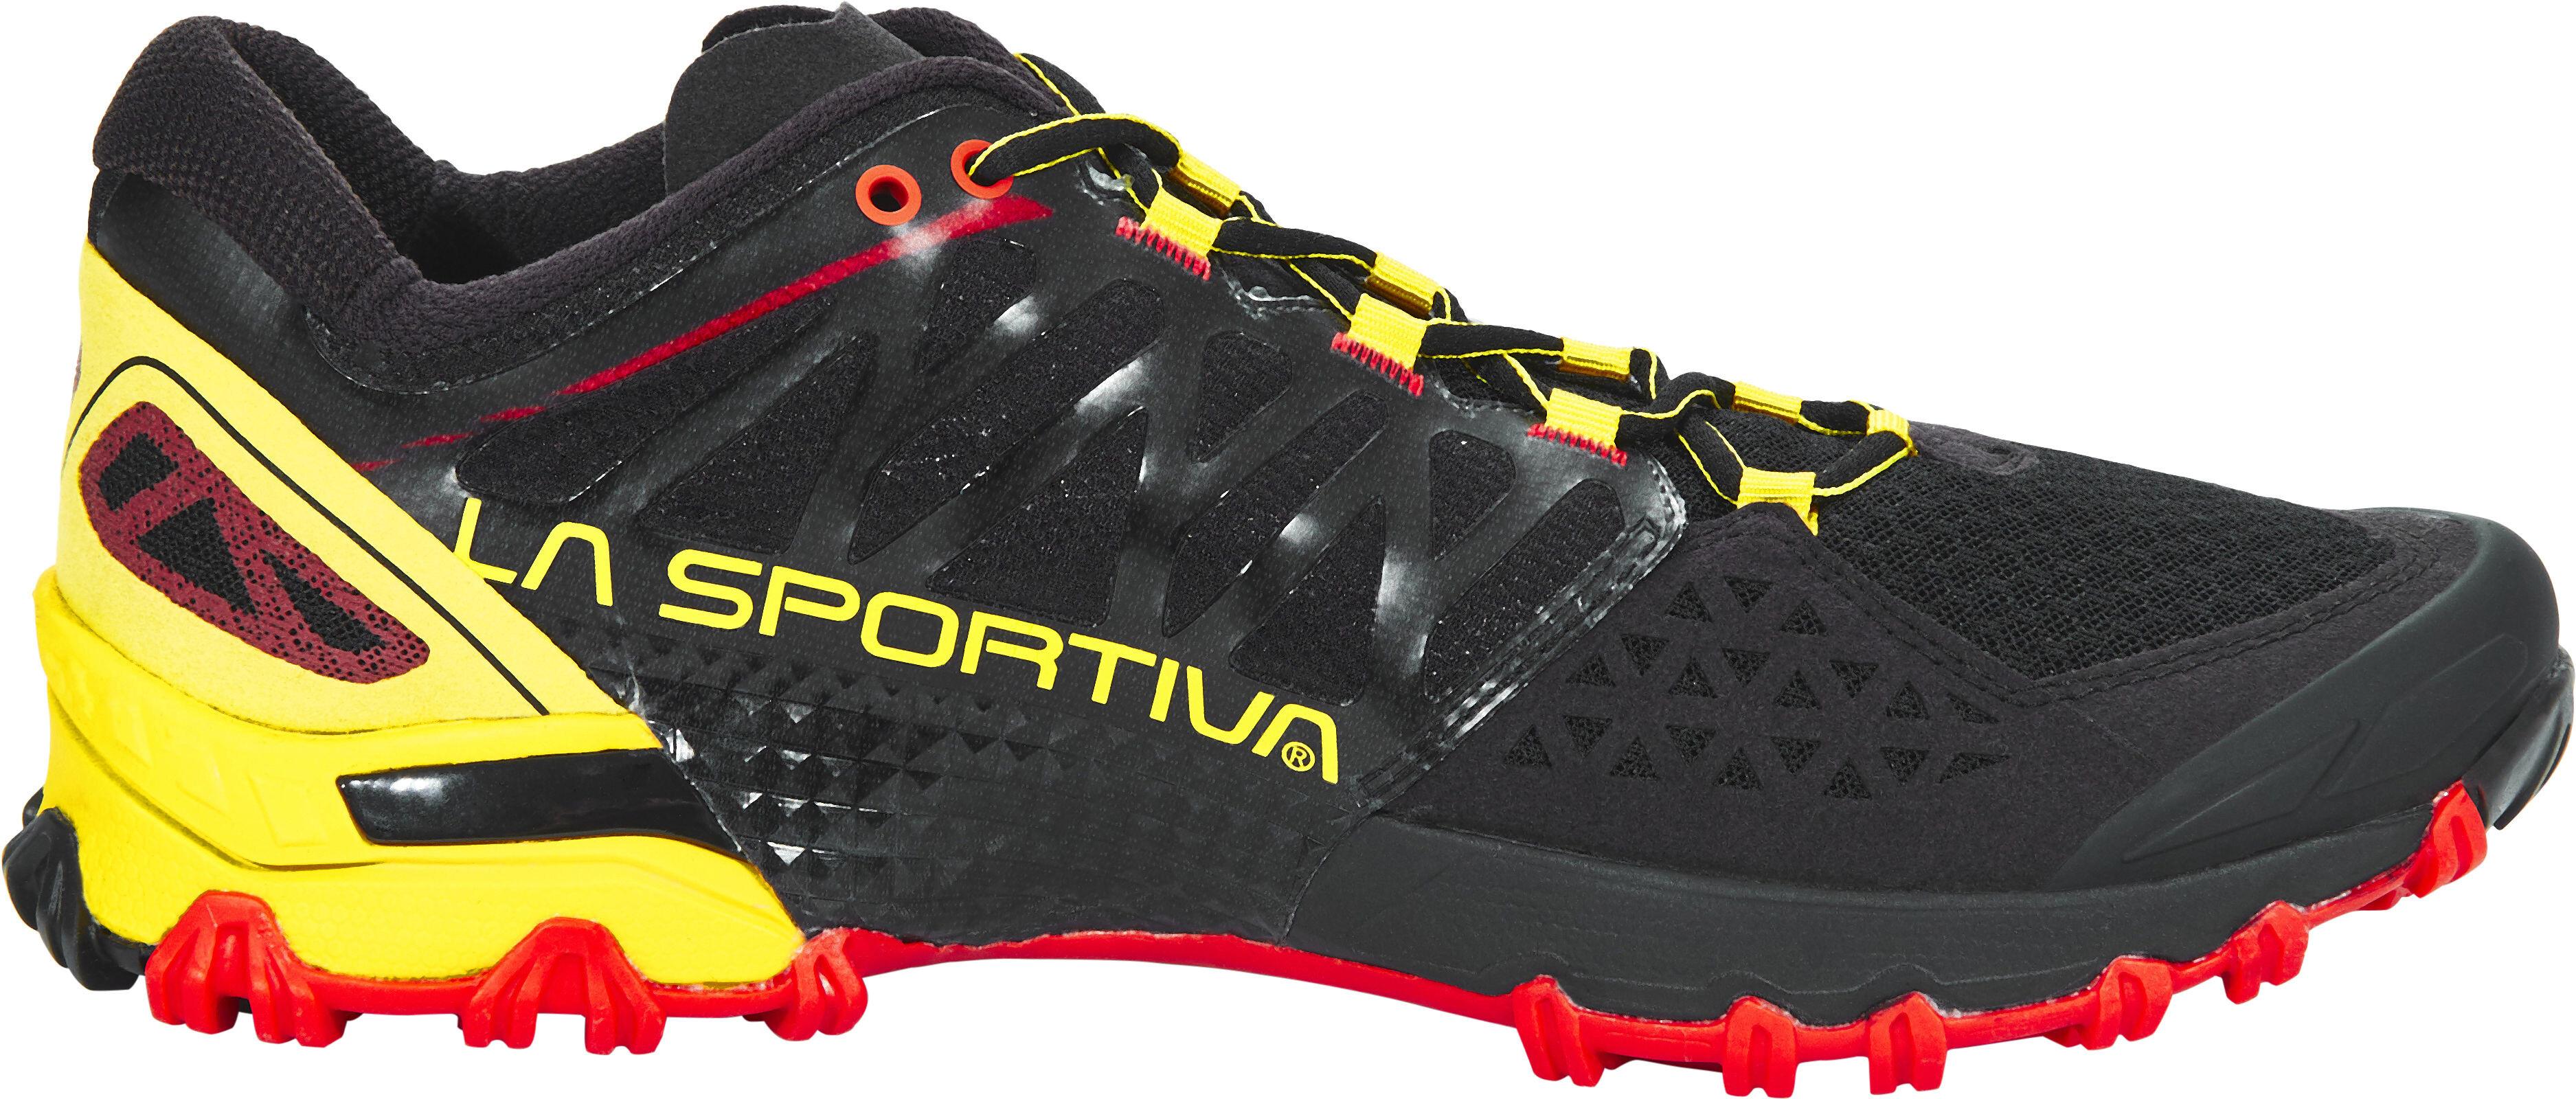 La Sportiva Bushido - Zapatillas running Hombre - amarillo negro ... af1fa6a0243